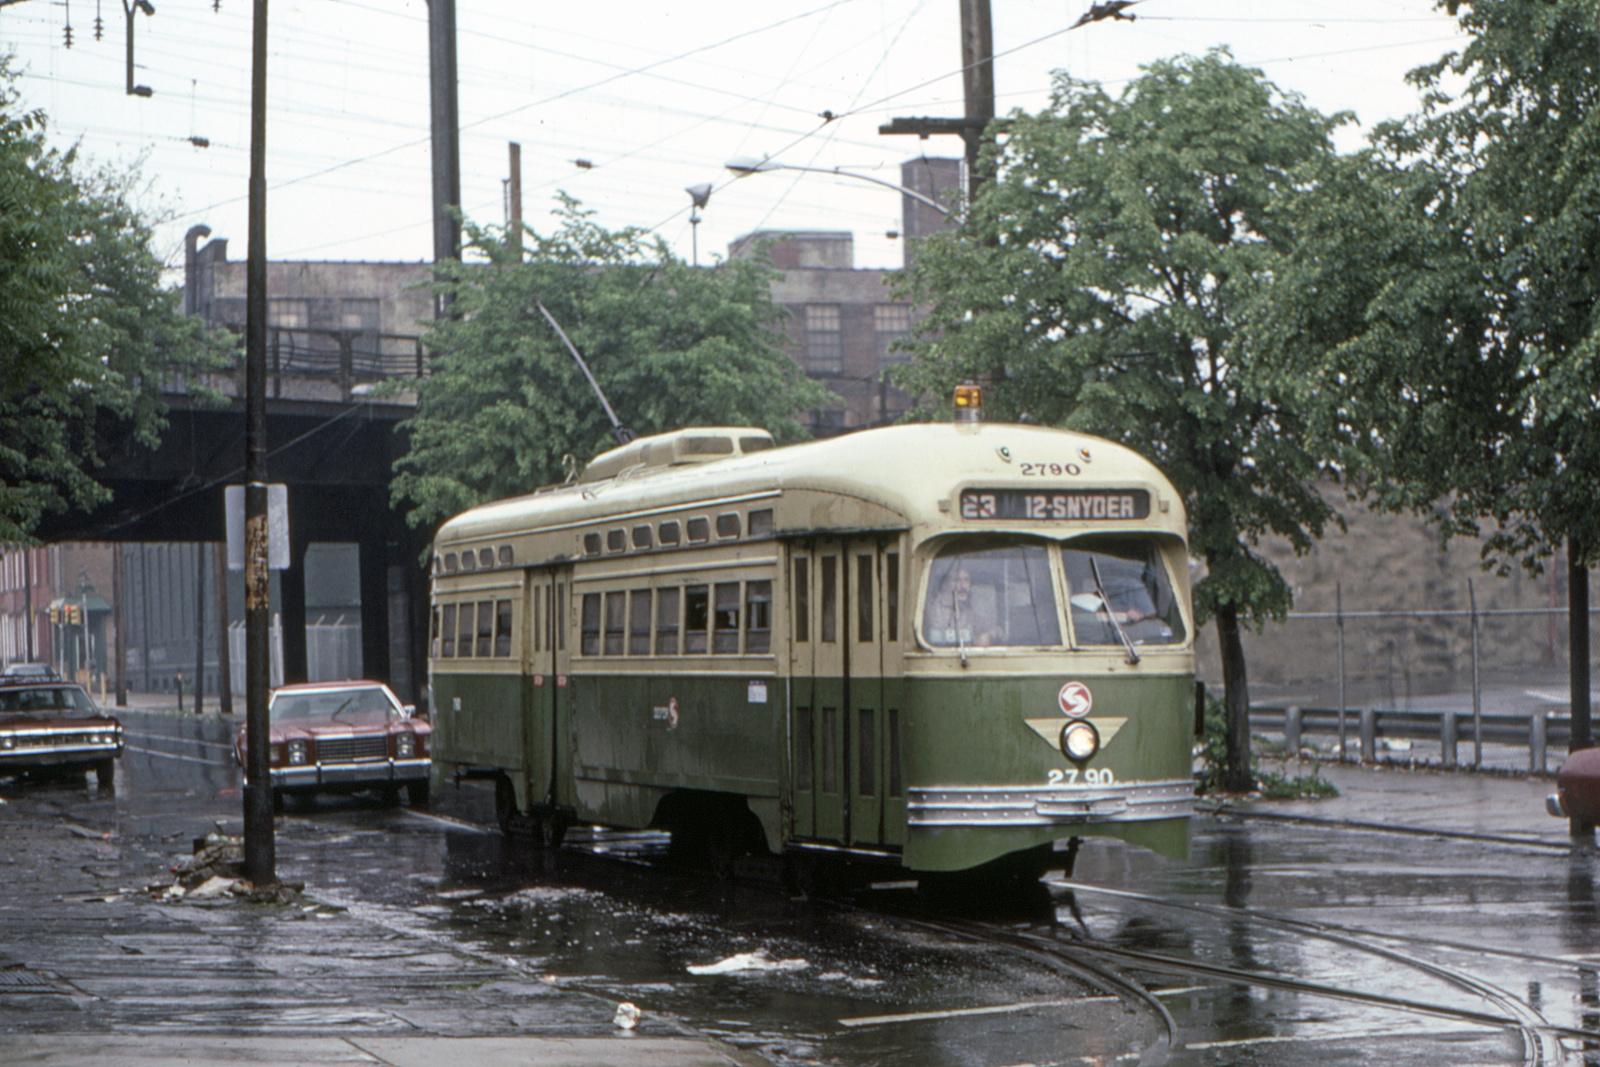 (734k, 1600x1067)<br><b>Country:</b> United States<br><b>City:</b> Philadelphia, PA<br><b>System:</b> SEPTA (or Predecessor)<br><b>Line:</b> Rt. 23-Germantown<br><b>Location:</b> 11th/Susquehanna<br><b>Car:</b> PTC/SEPTA Postwar All-electric PCC (St.Louis, 1947) 2790 <br><b>Collection of:</b> David Pirmann<br><b>Date:</b> 7/1983<br><b>Viewed (this week/total):</b> 1 / 113